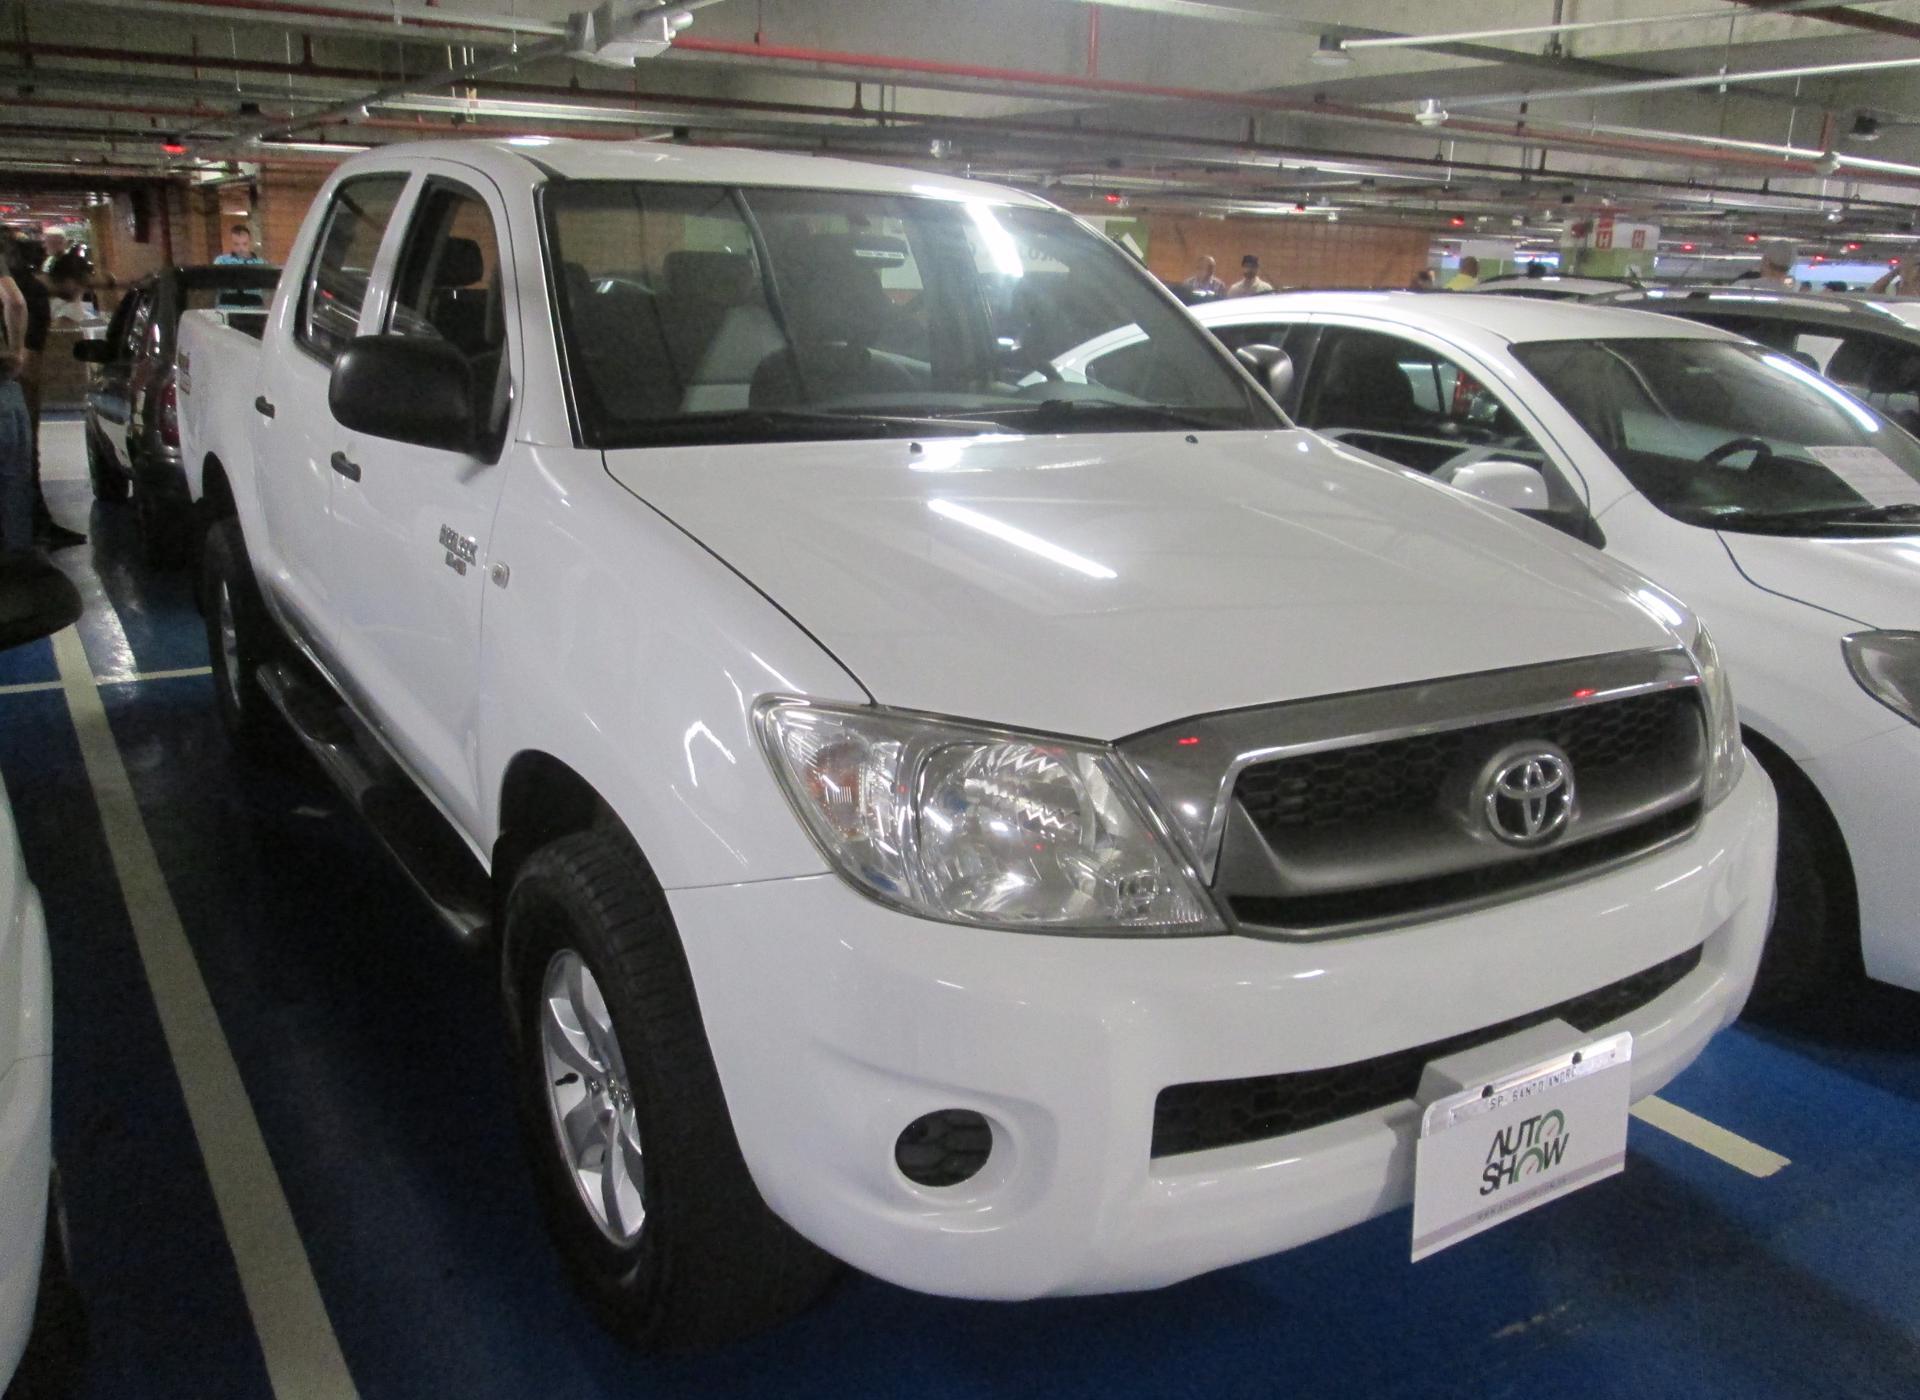 Feirão Auto Show Shopping ABC - TOYOTA HILUX CD D4-D 4X4 2.5 16V 102CV TB DIES. 2009-2009